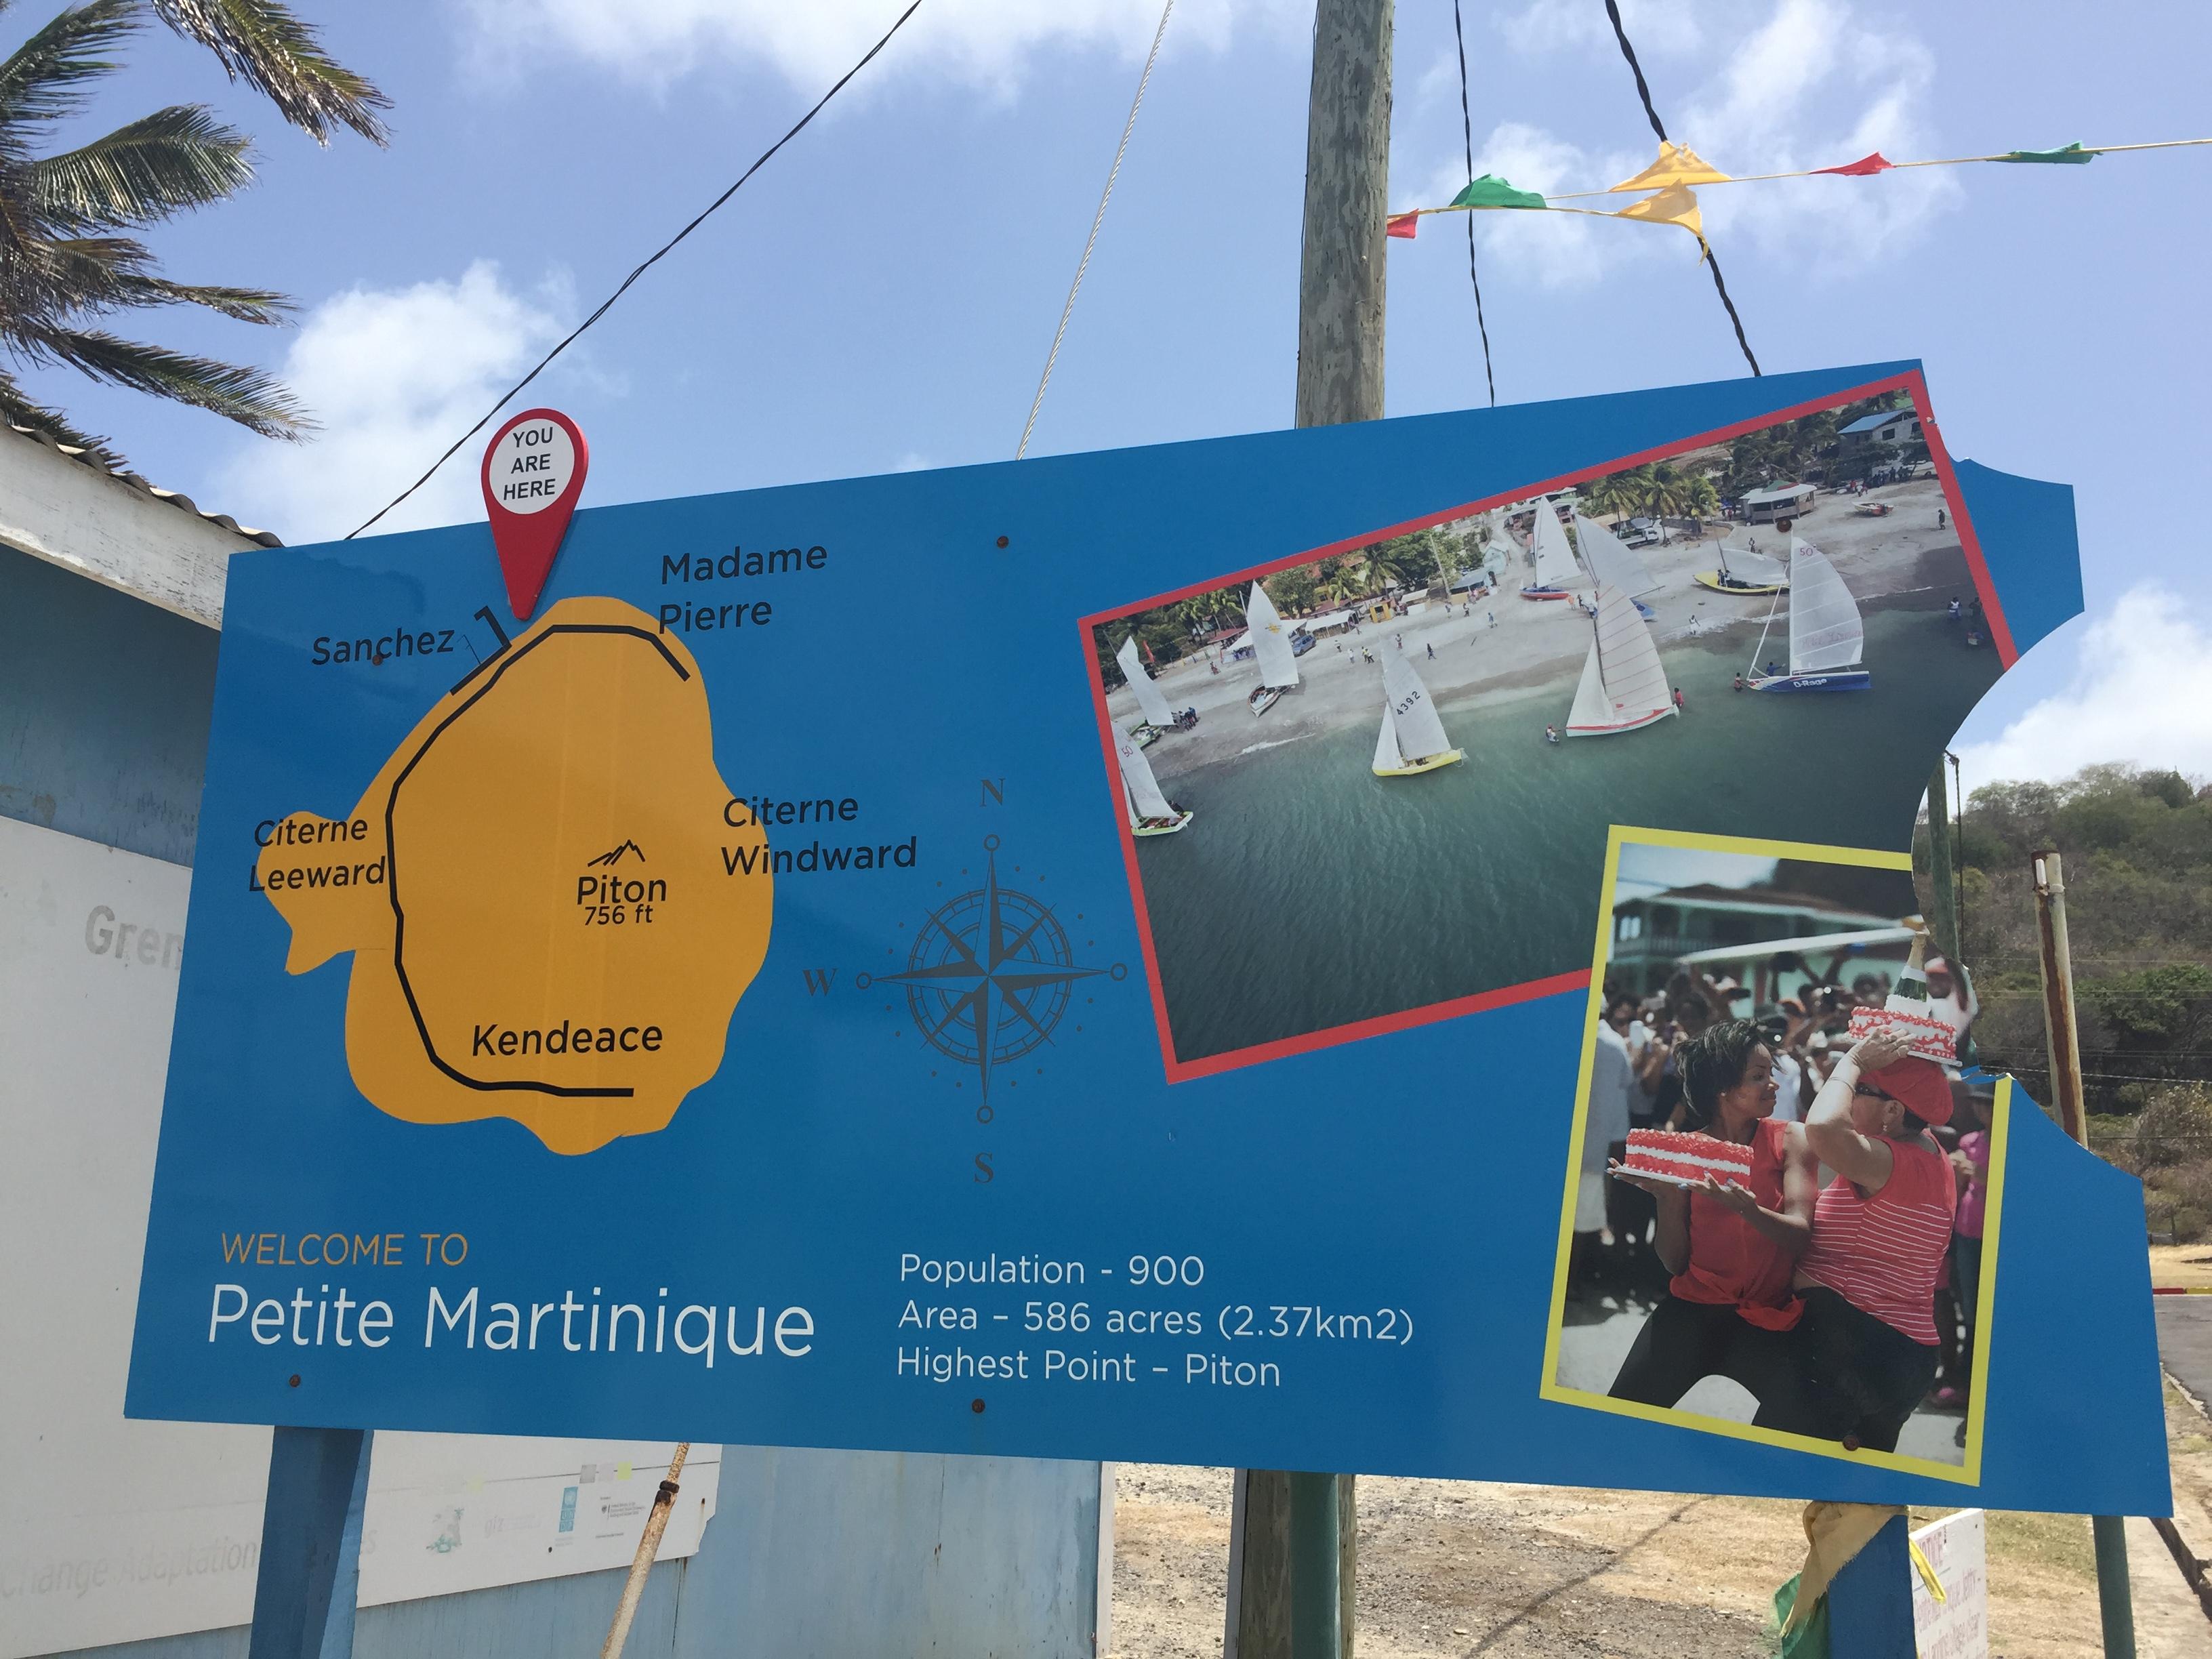 Petit Martinique welcome